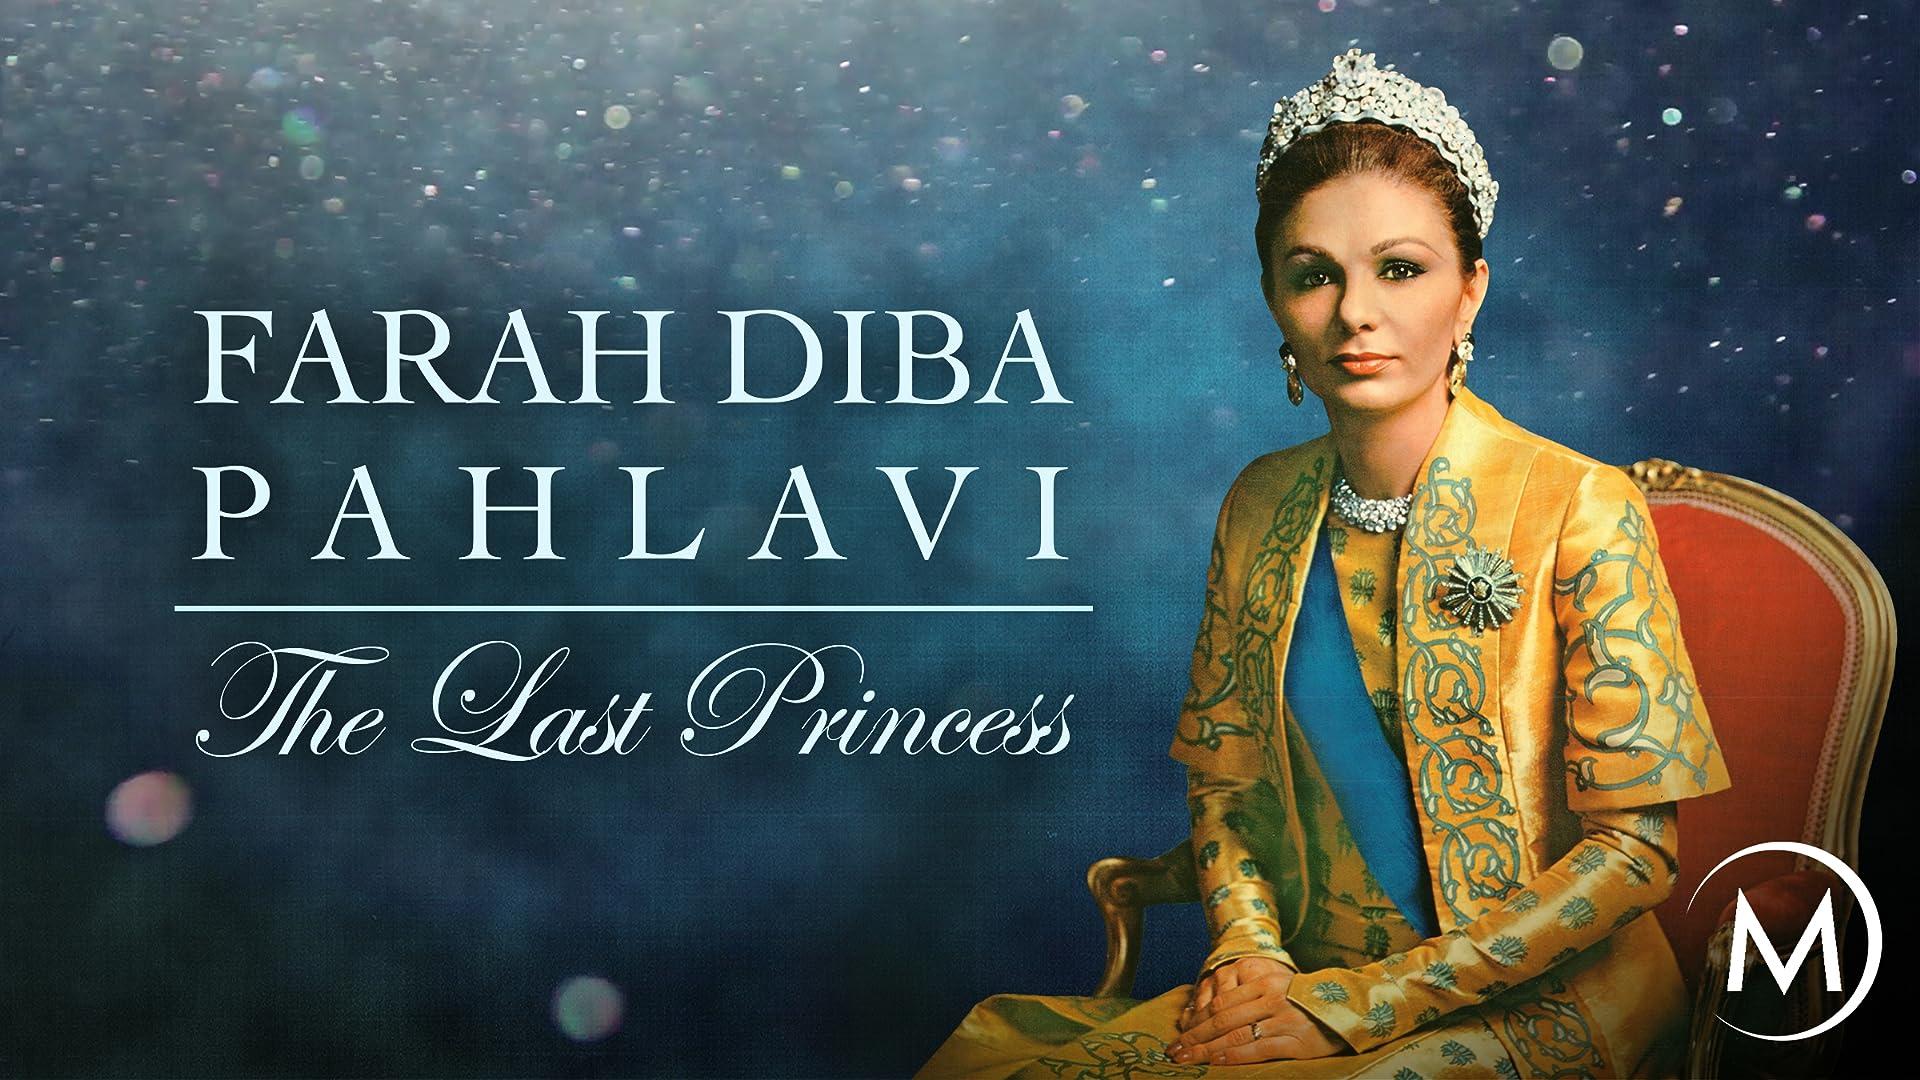 Farah Diba Pahlavi: The Last Princess